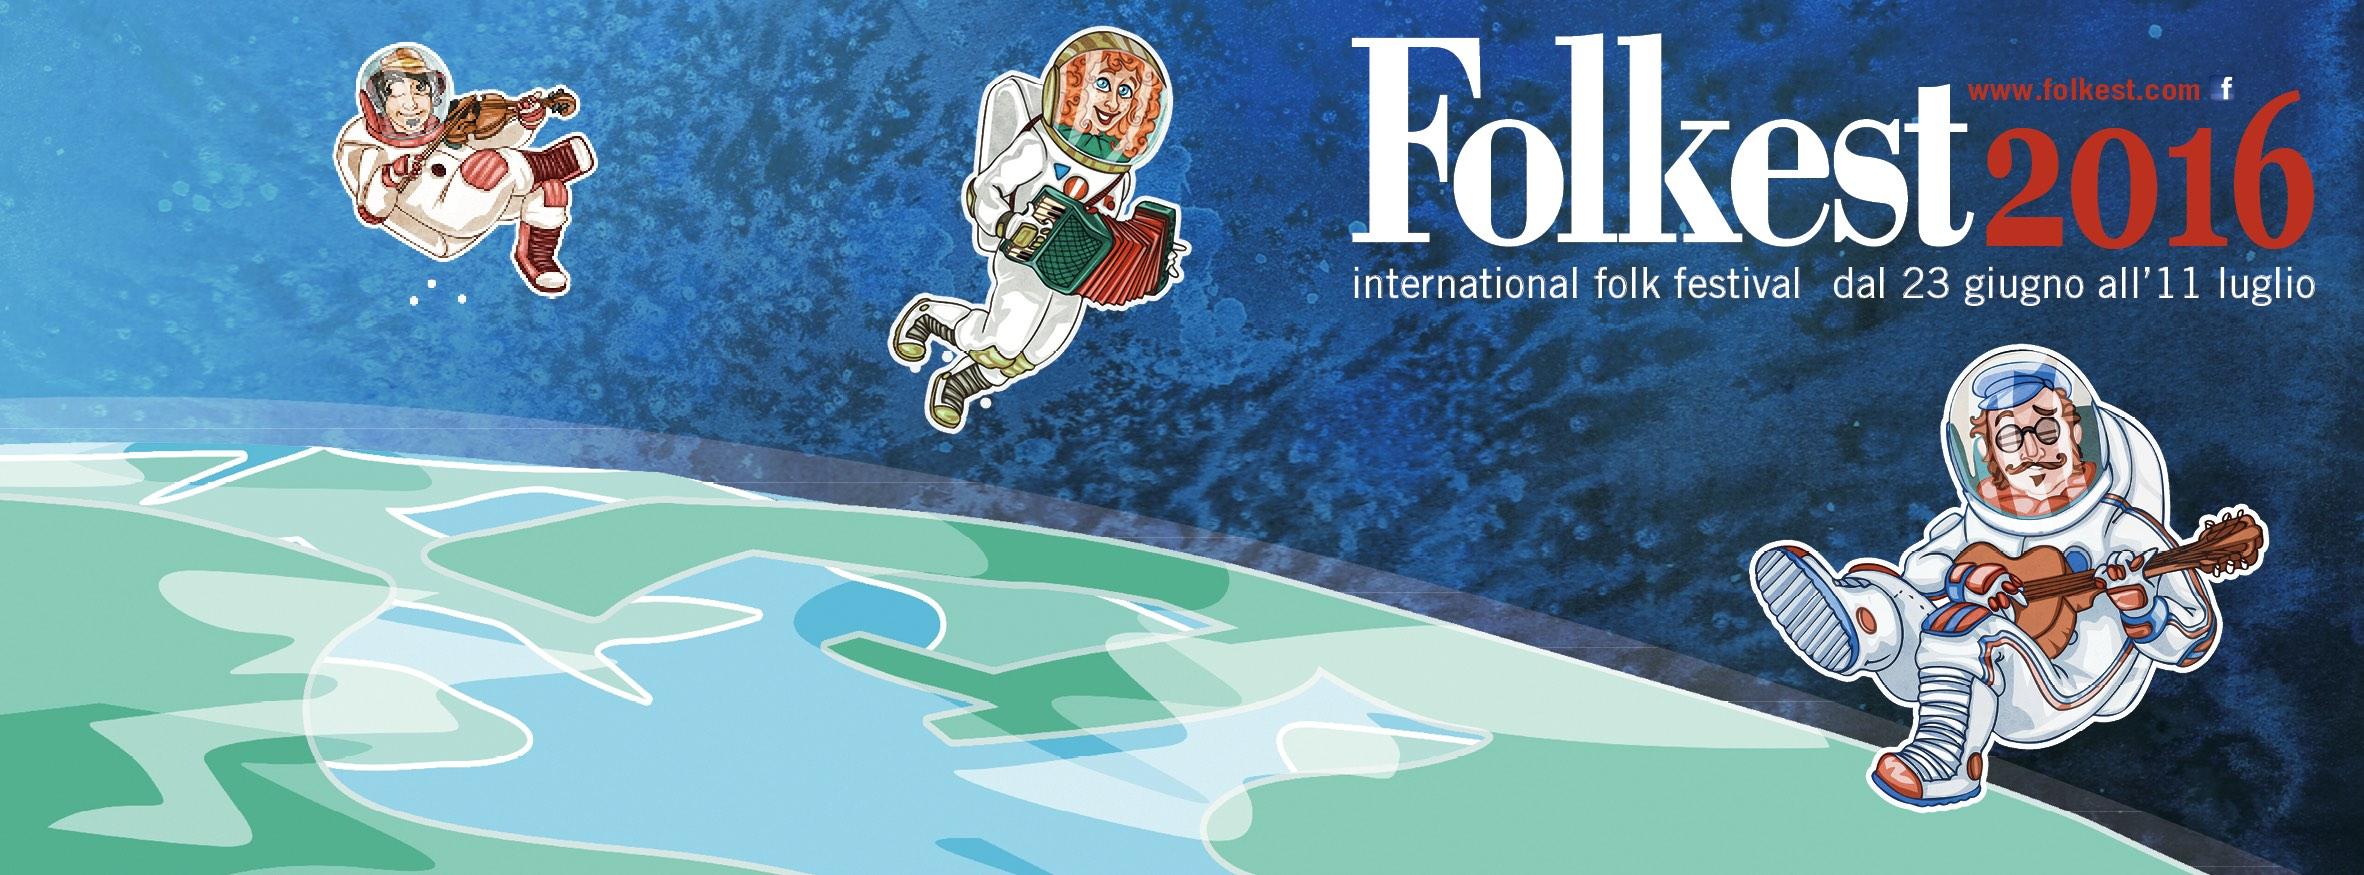 Copertina Facebook Folkest 2016